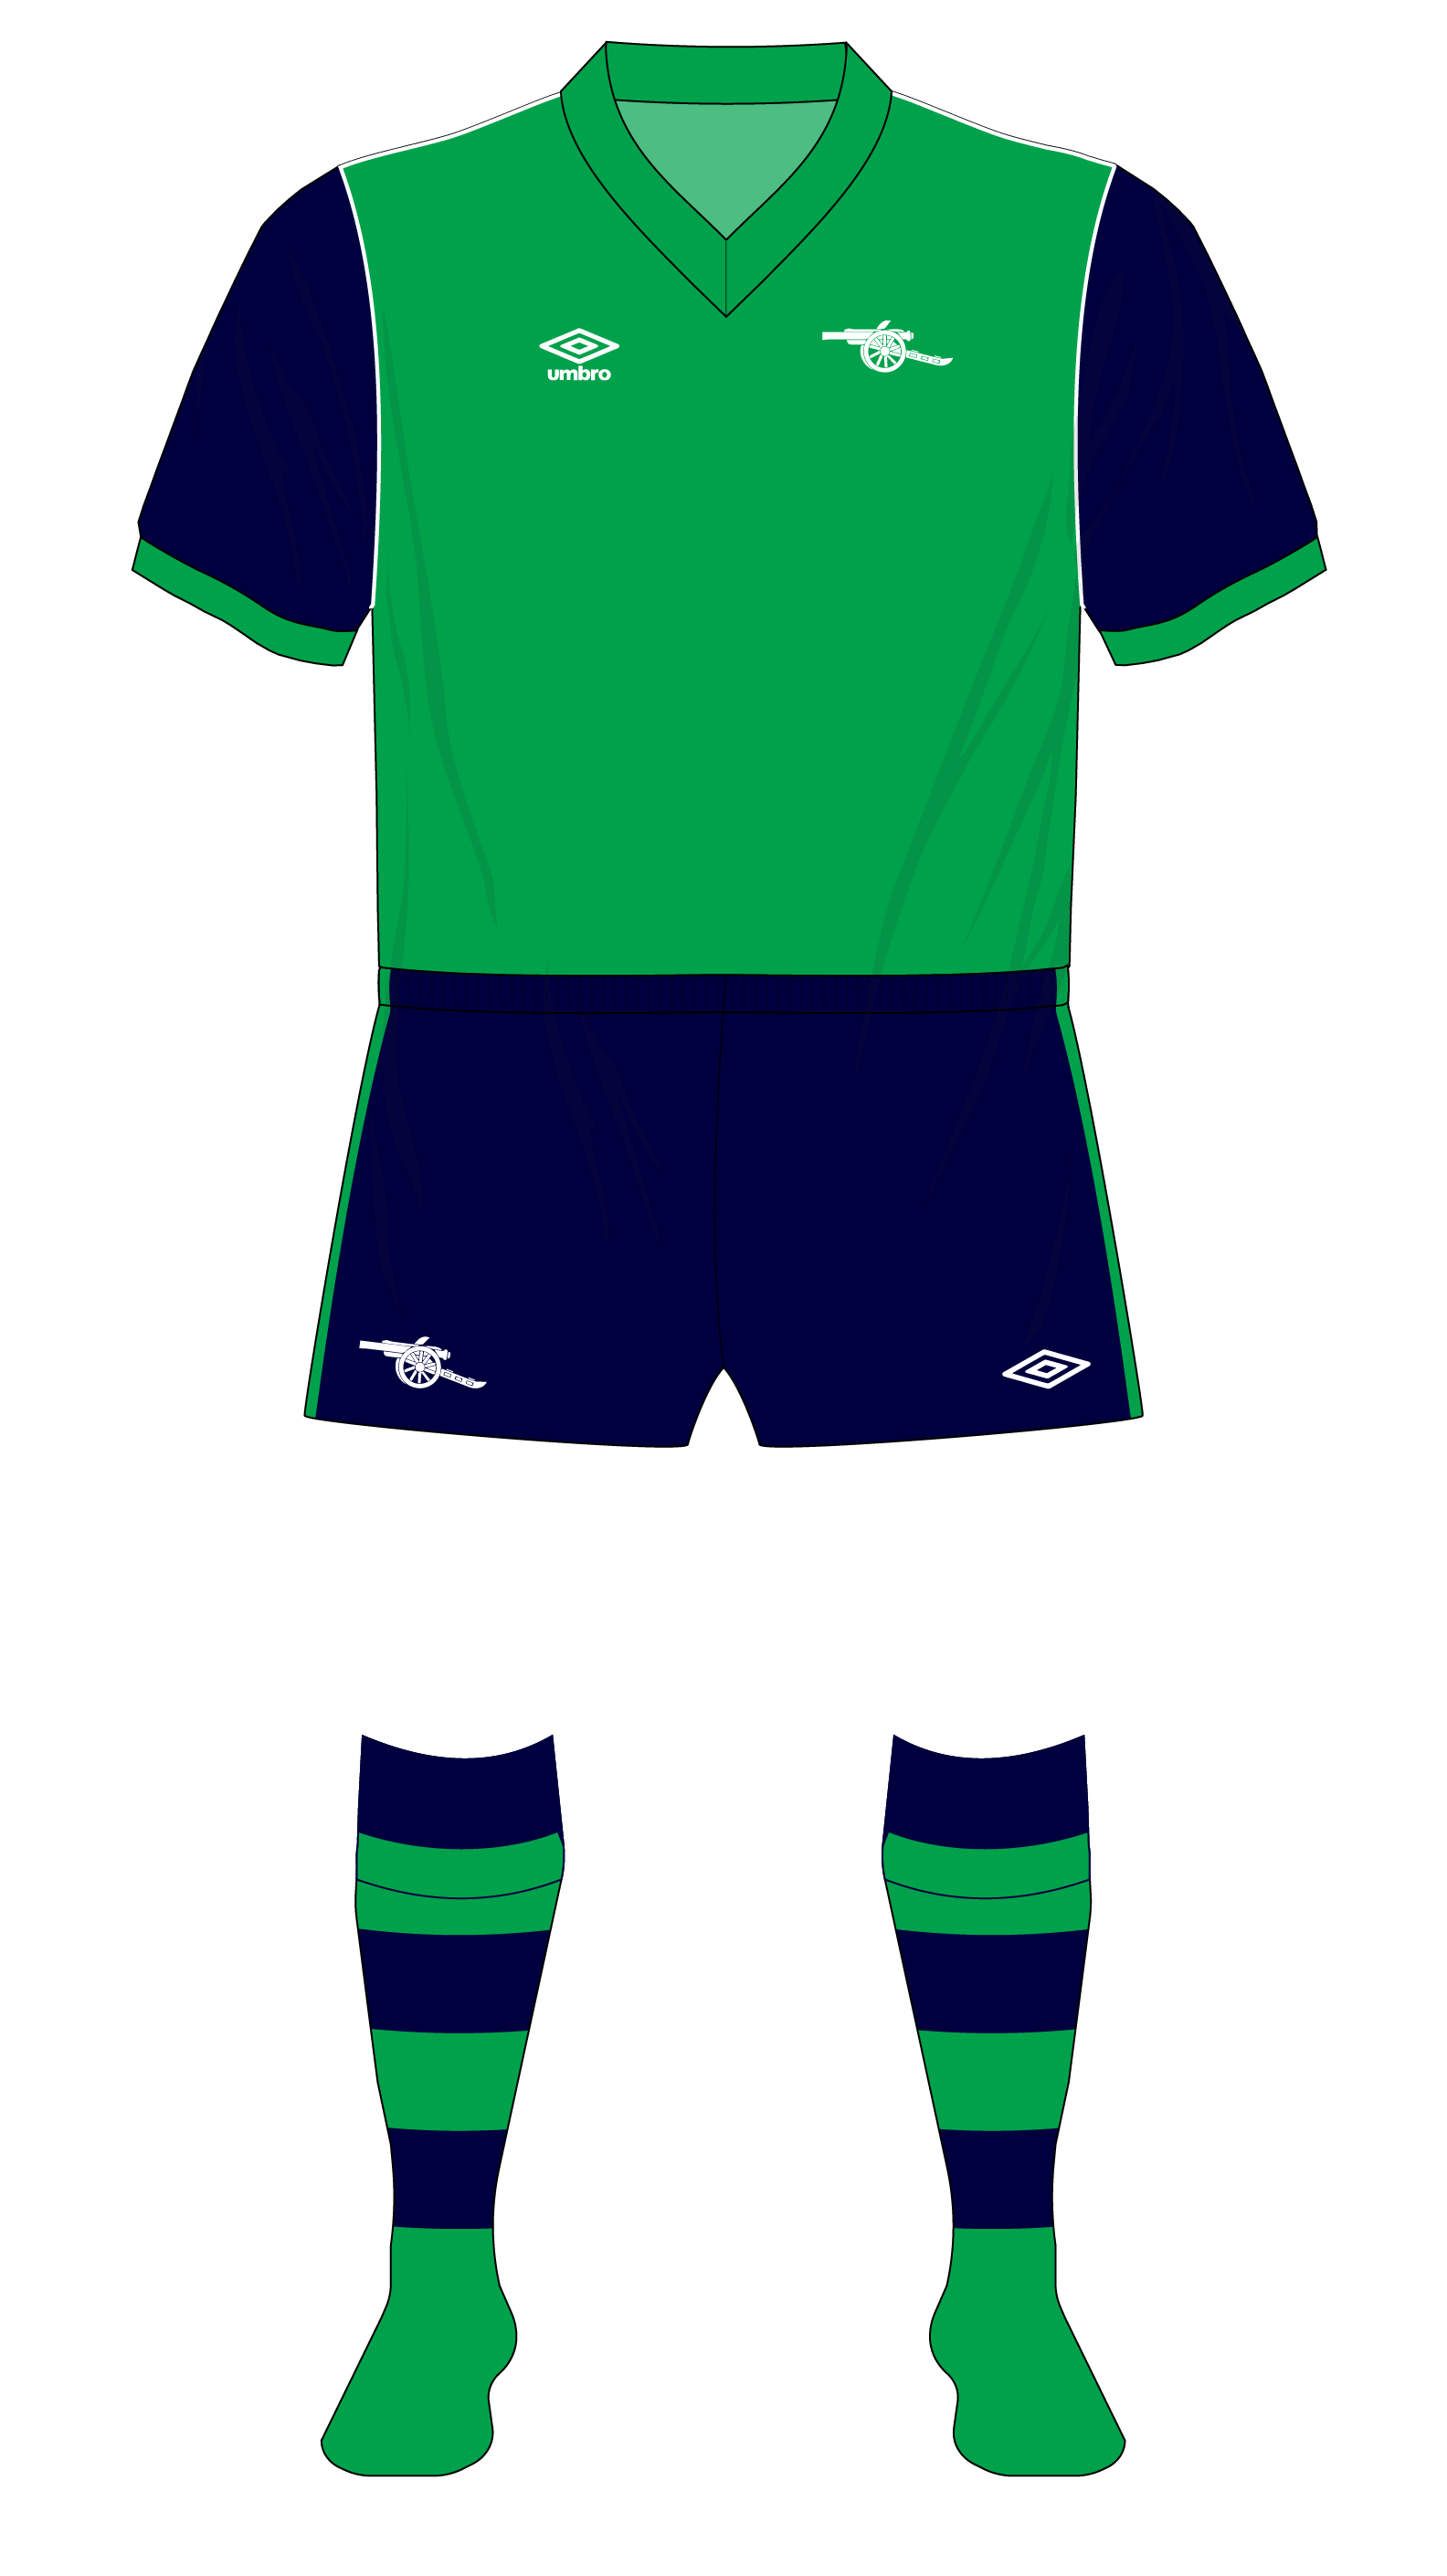 pretty nice 8b737 db111 Arsenal-1982-1983-away-kit-green-Spartak-Moscow-01 – Museum ...